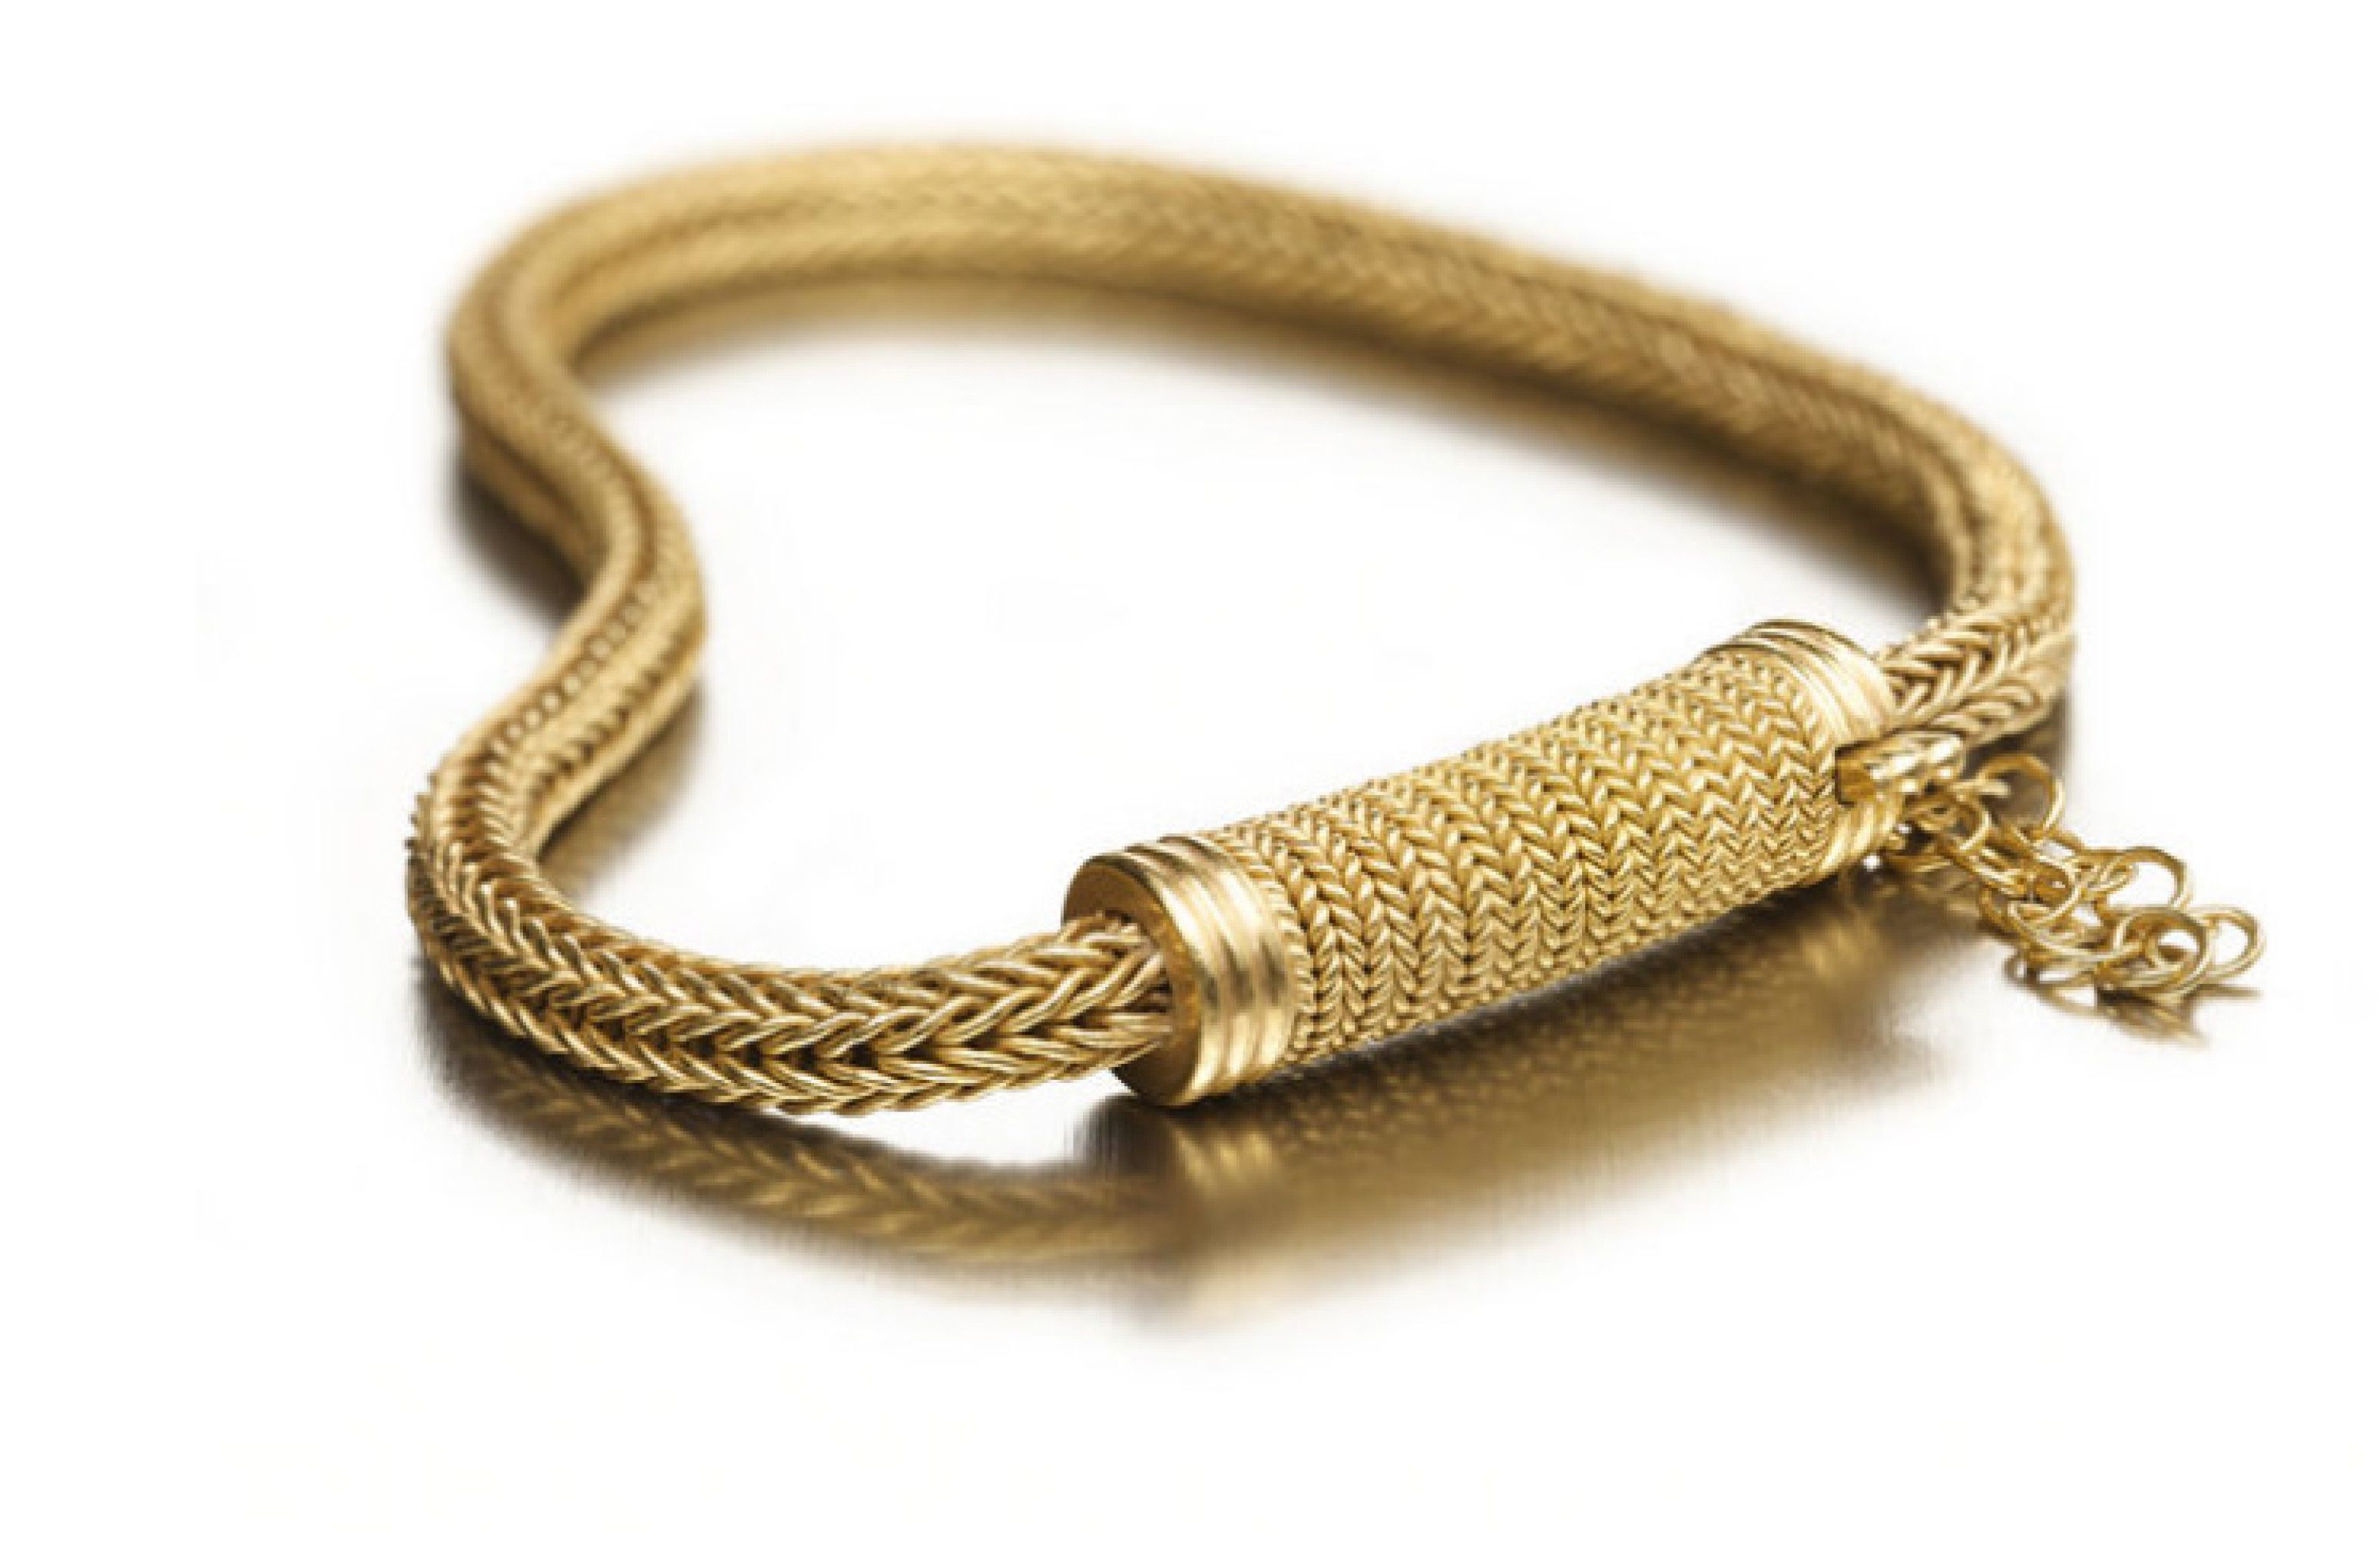 JewelryWhite_14.jpg